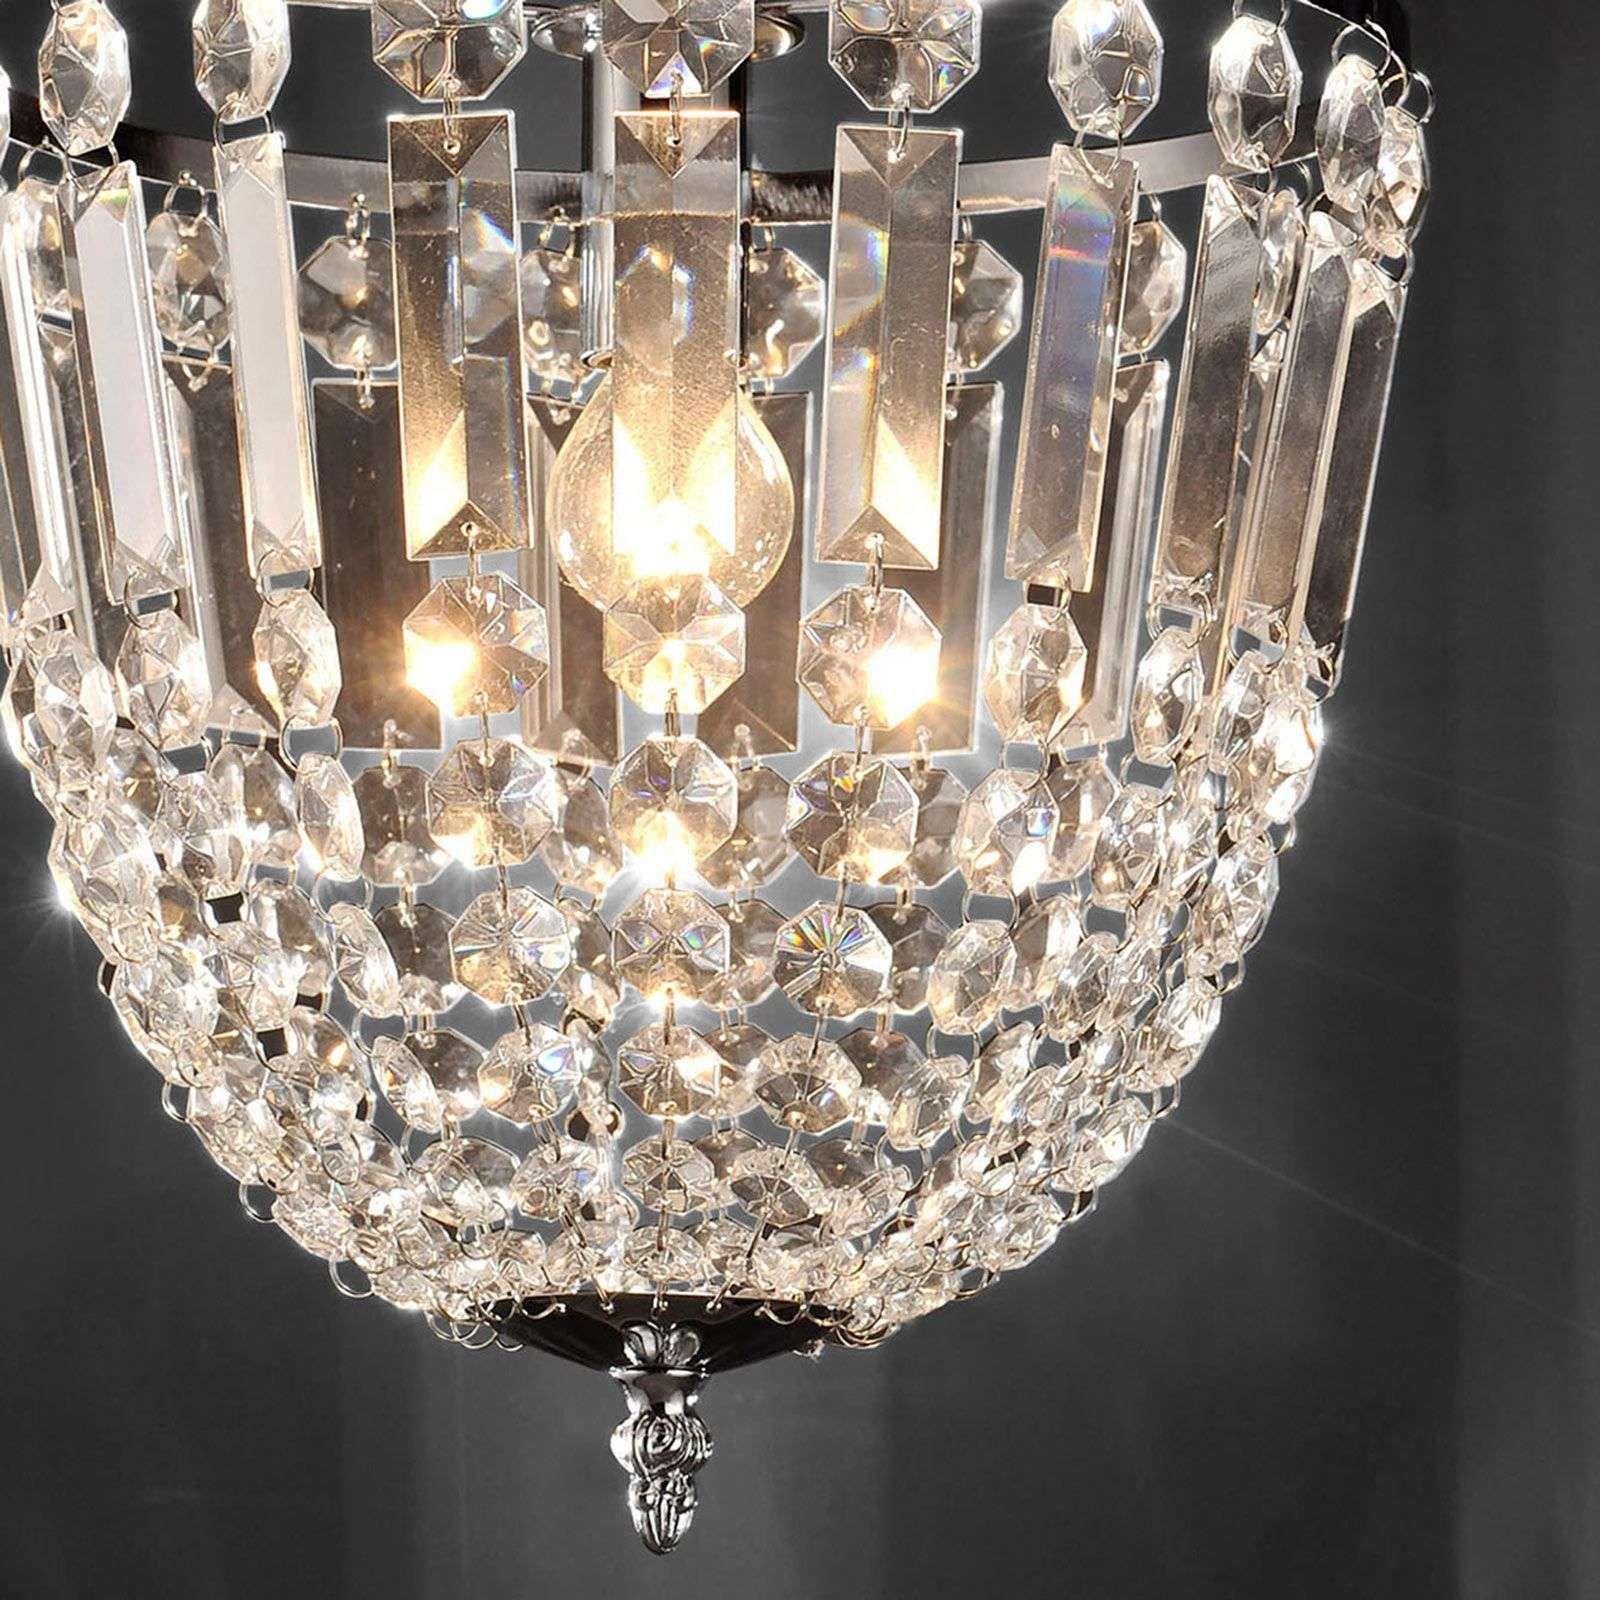 Kristall Deckenleuchte Kamea Kristall Deckenleuchte Beleuchtung Decke Spiegel Mit Beleuchtung